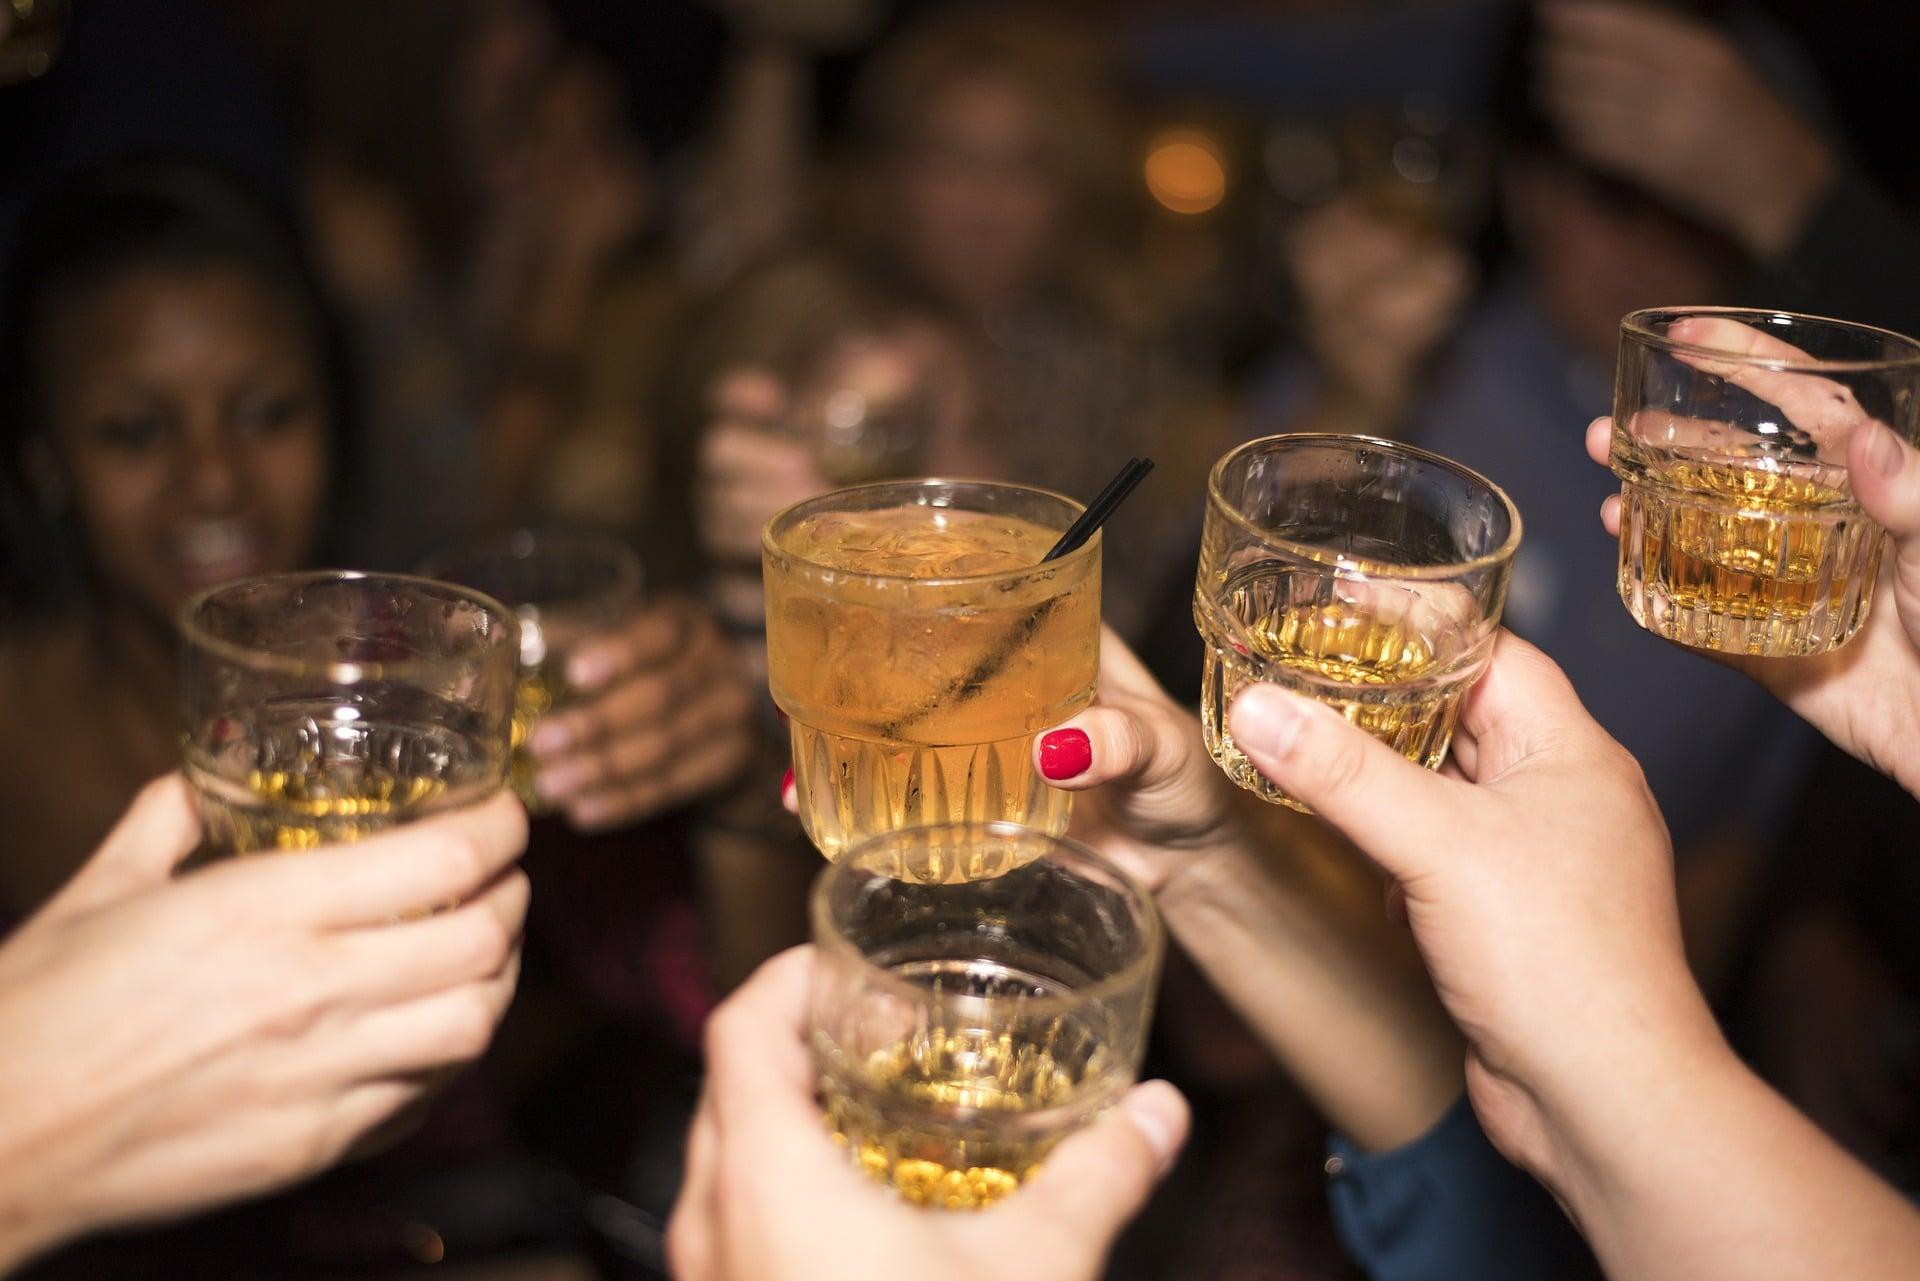 factores de riesgo del alcohol